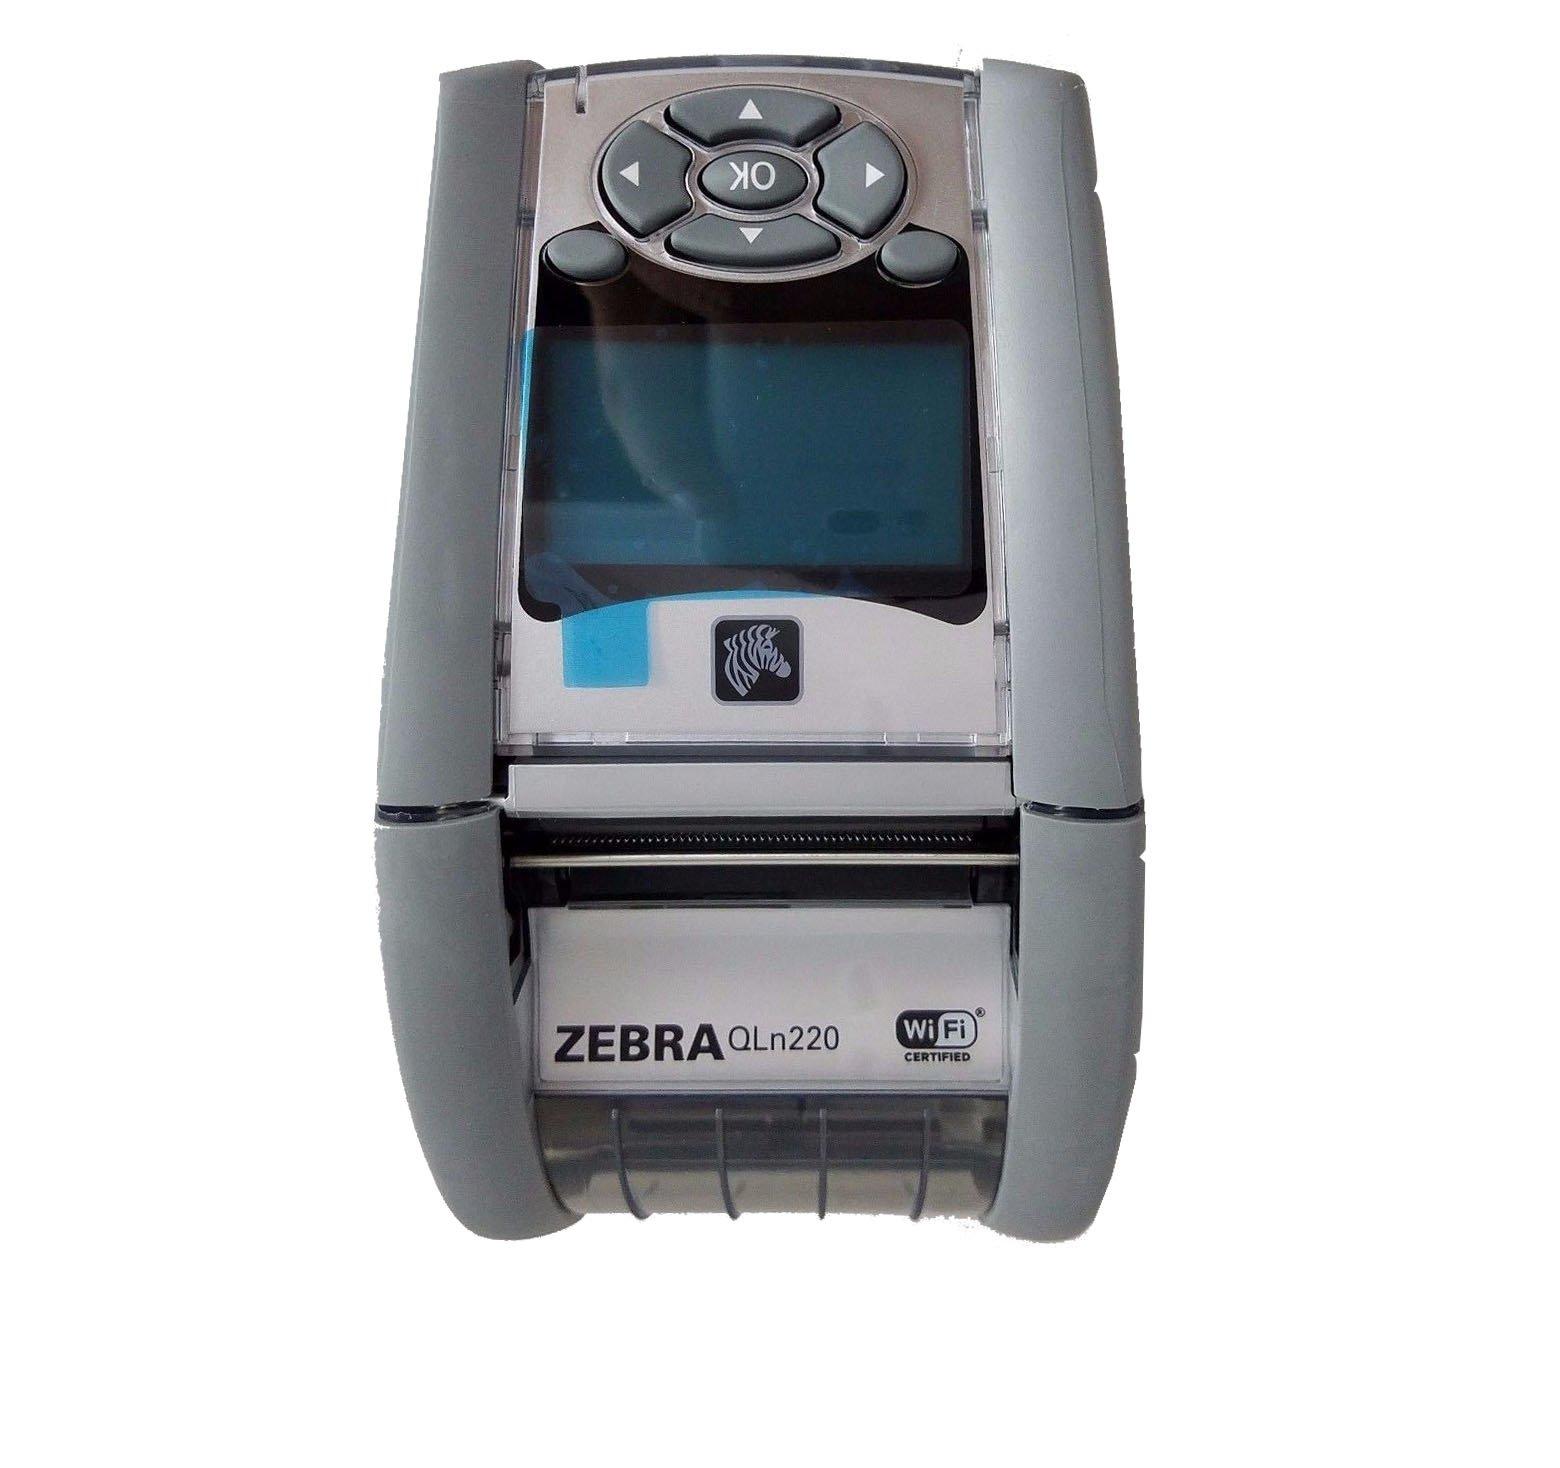 Zebra QN2-AUNA0M00-00 QLN 220 Direct Thermal Mobile Label Printer, Bluetooth and Wi-Fi, Monochrome, 203 dpi, 2.75'' H x 3.5'' W x 6.5'' D